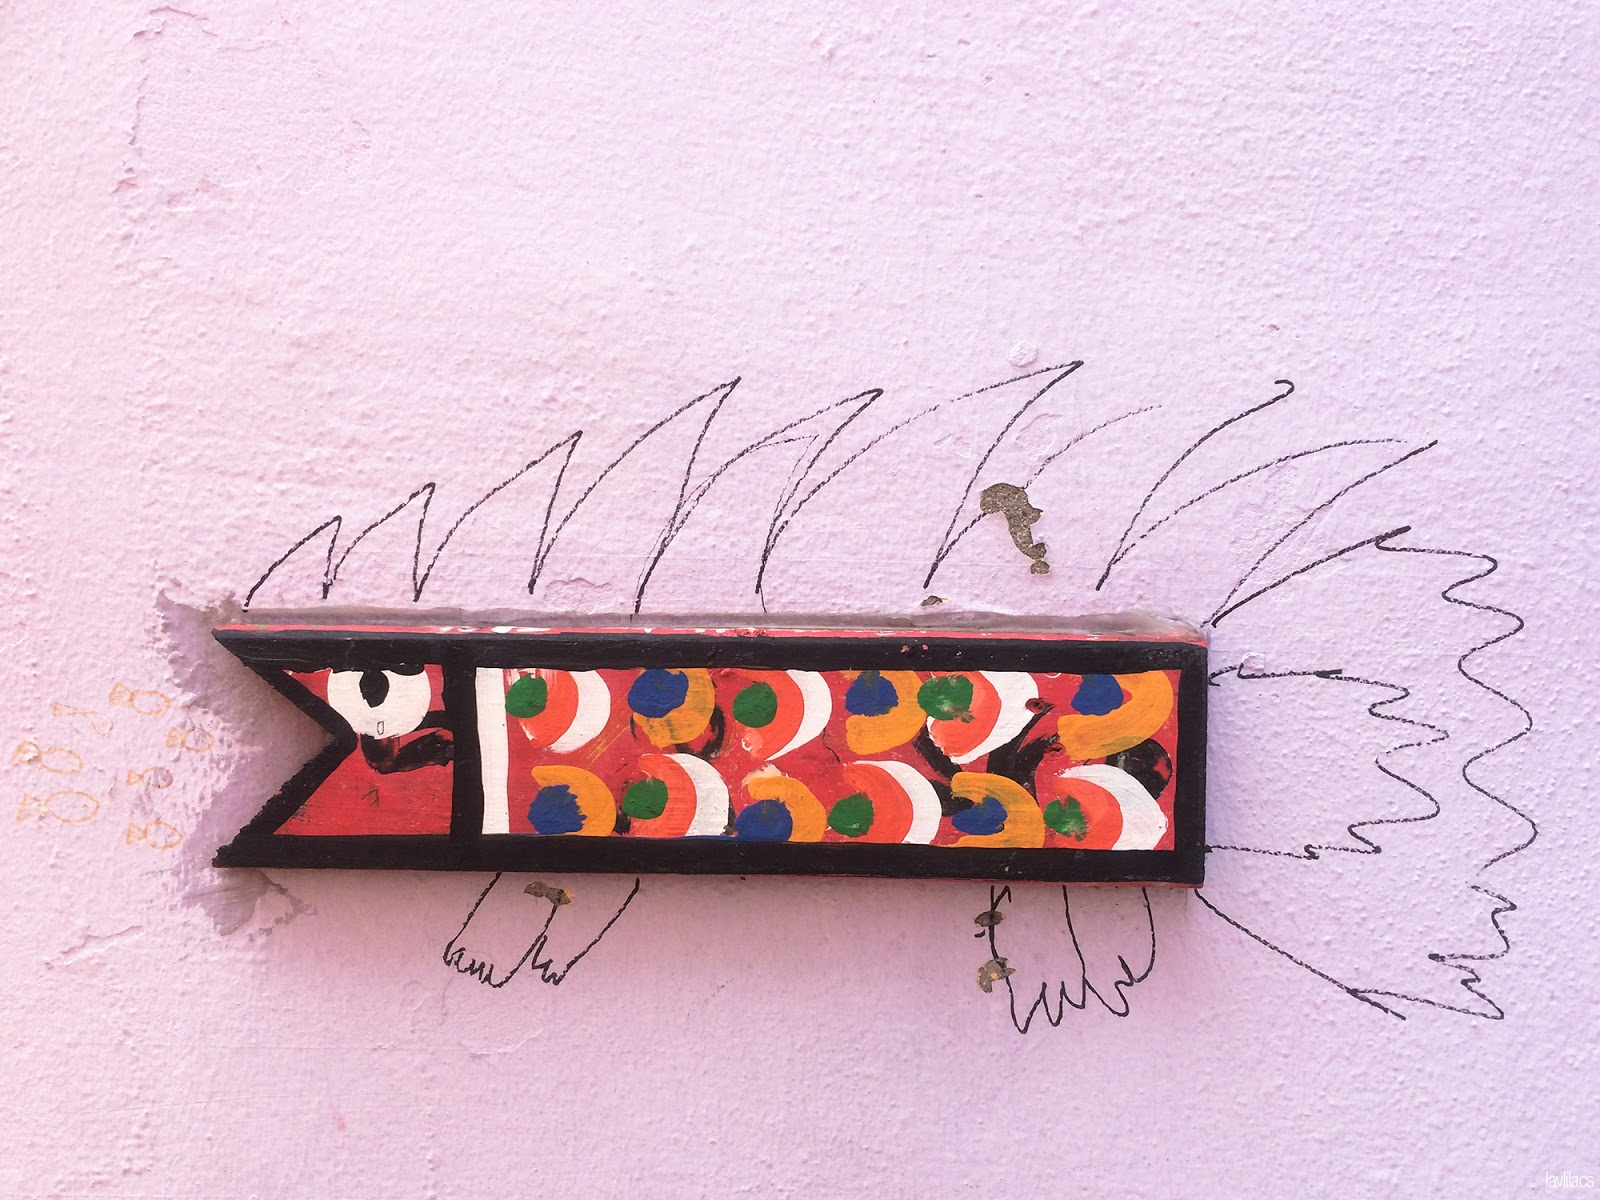 Seoul, Korea - Summer Study Abroad 2014 - Gamcheon Culture Village fish wall art